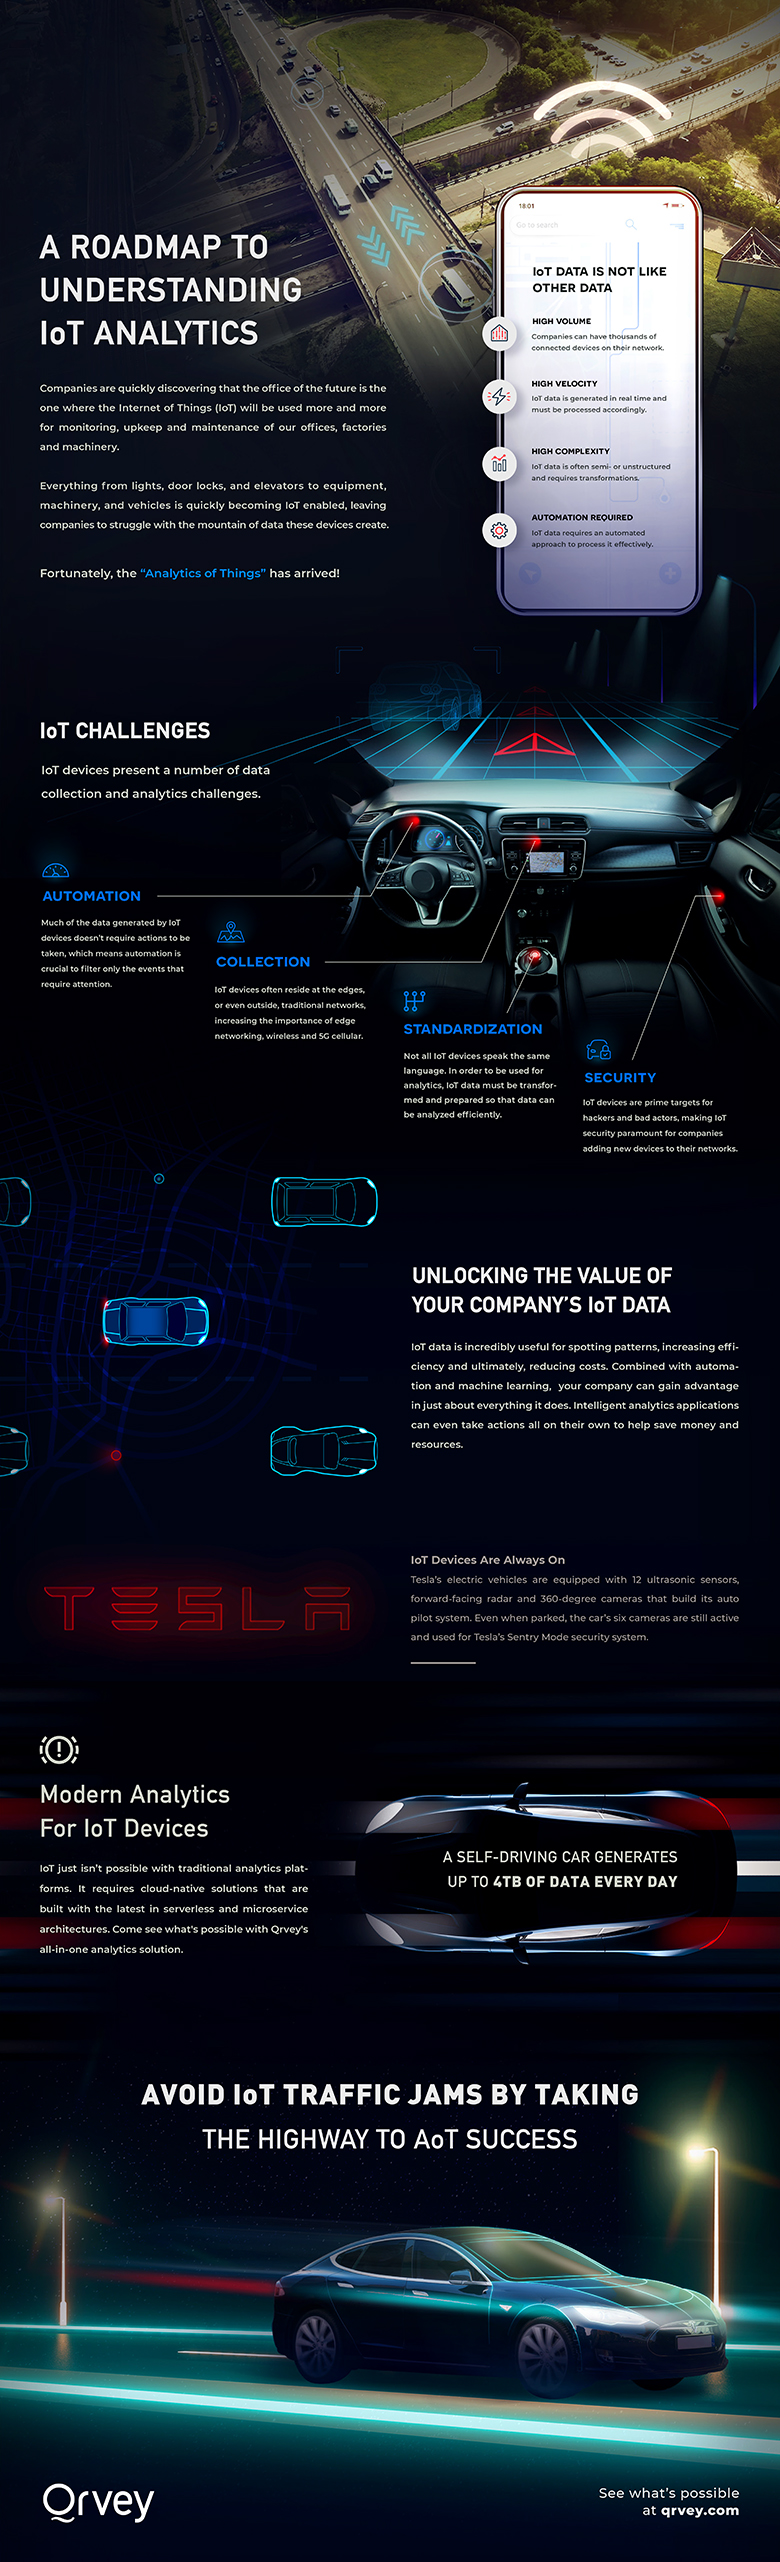 Infographic: Roadmap to IoT Analytics